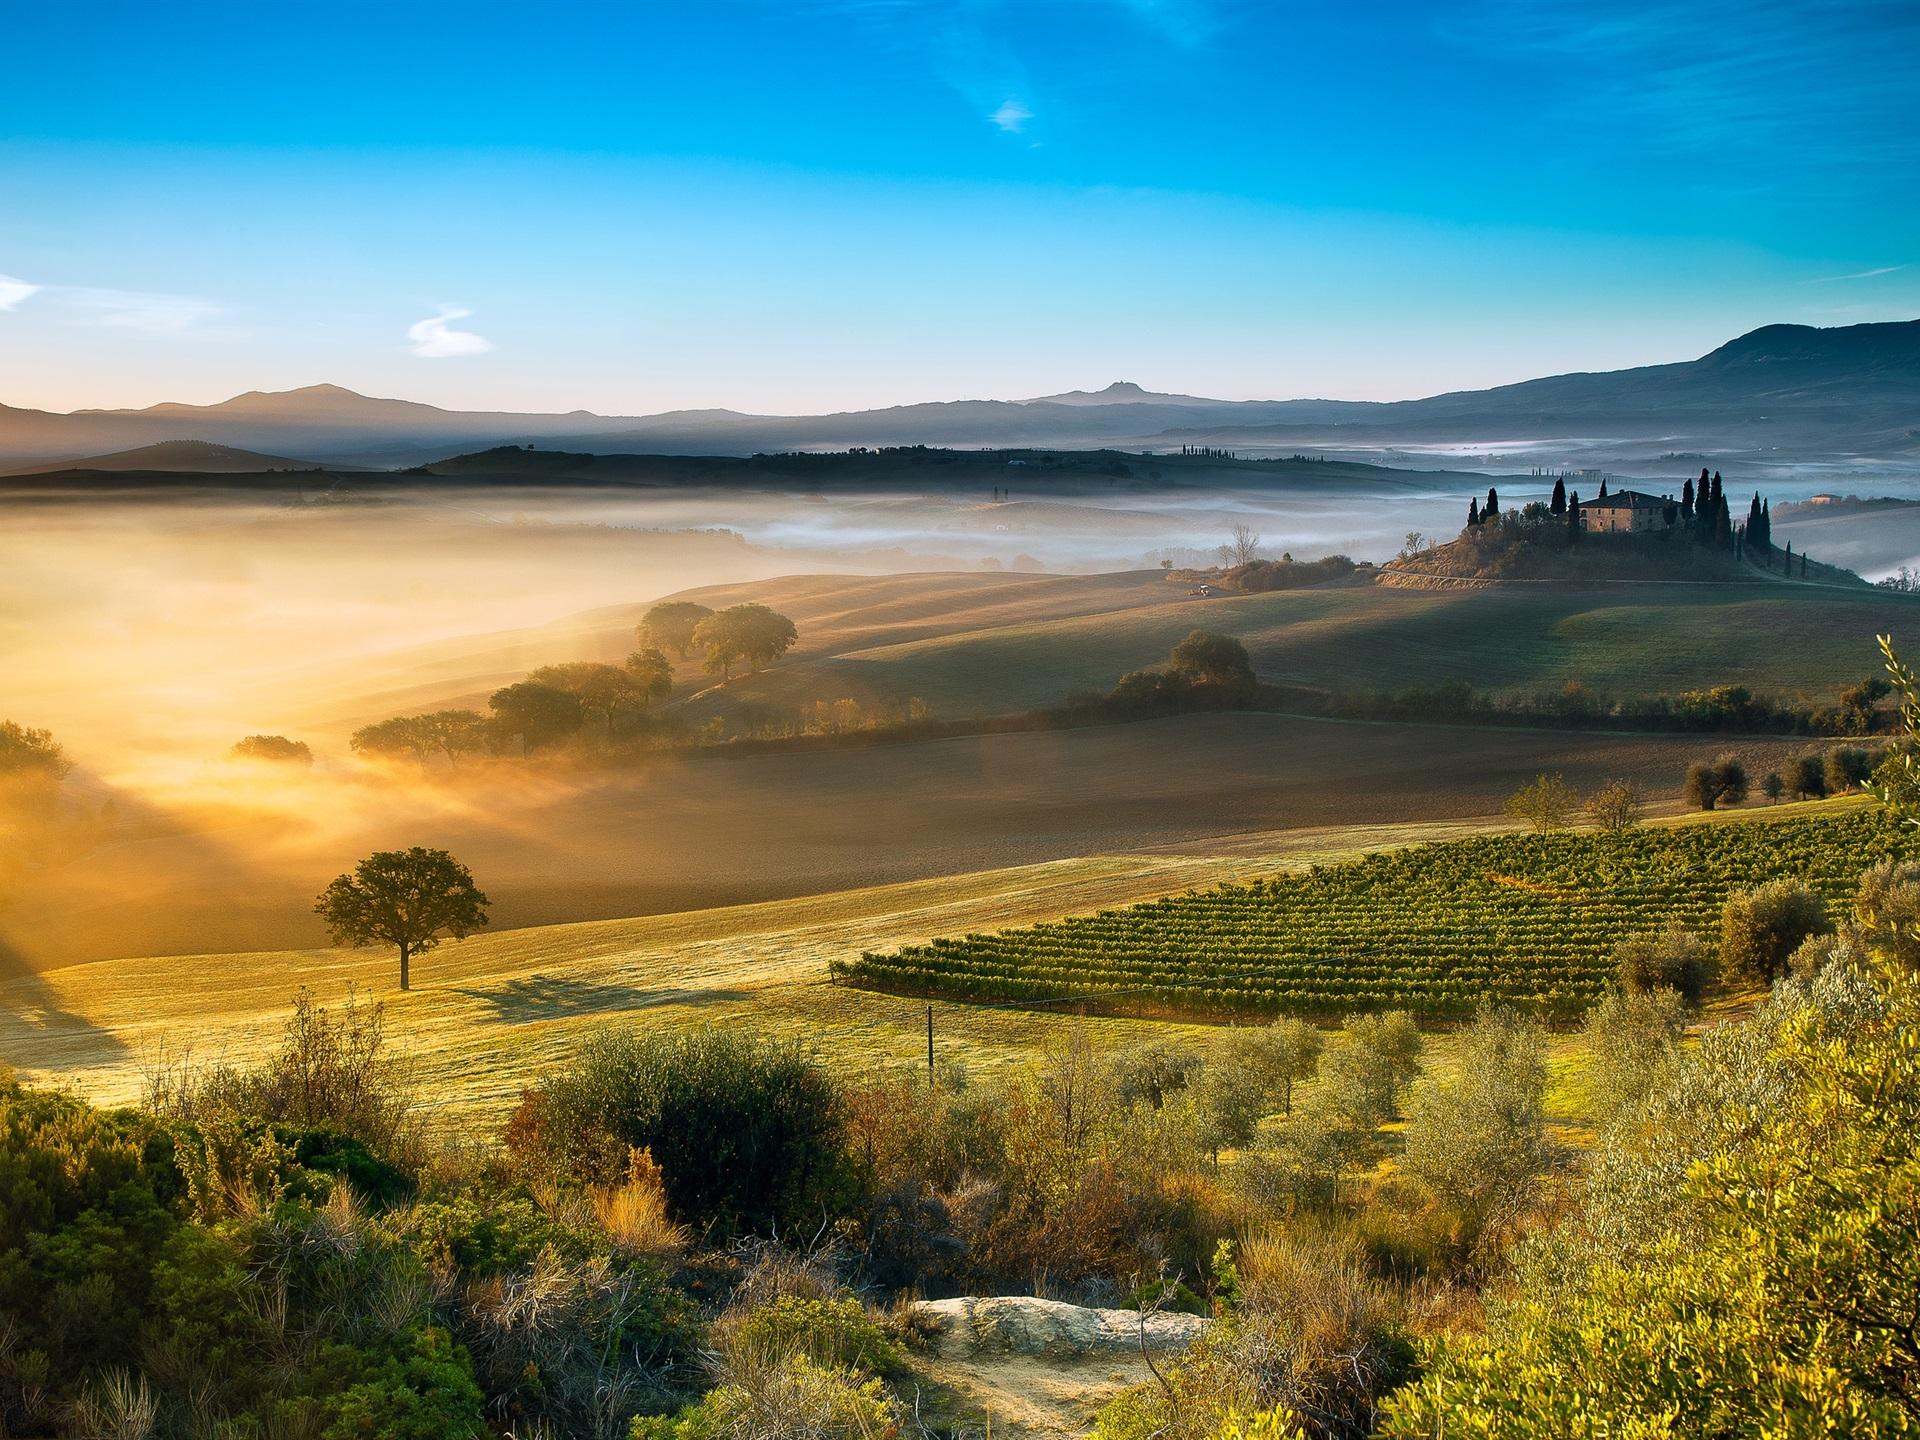 Fonds D Ecran Italie Toscane Belle Campagne 1920x1440 Hd Image